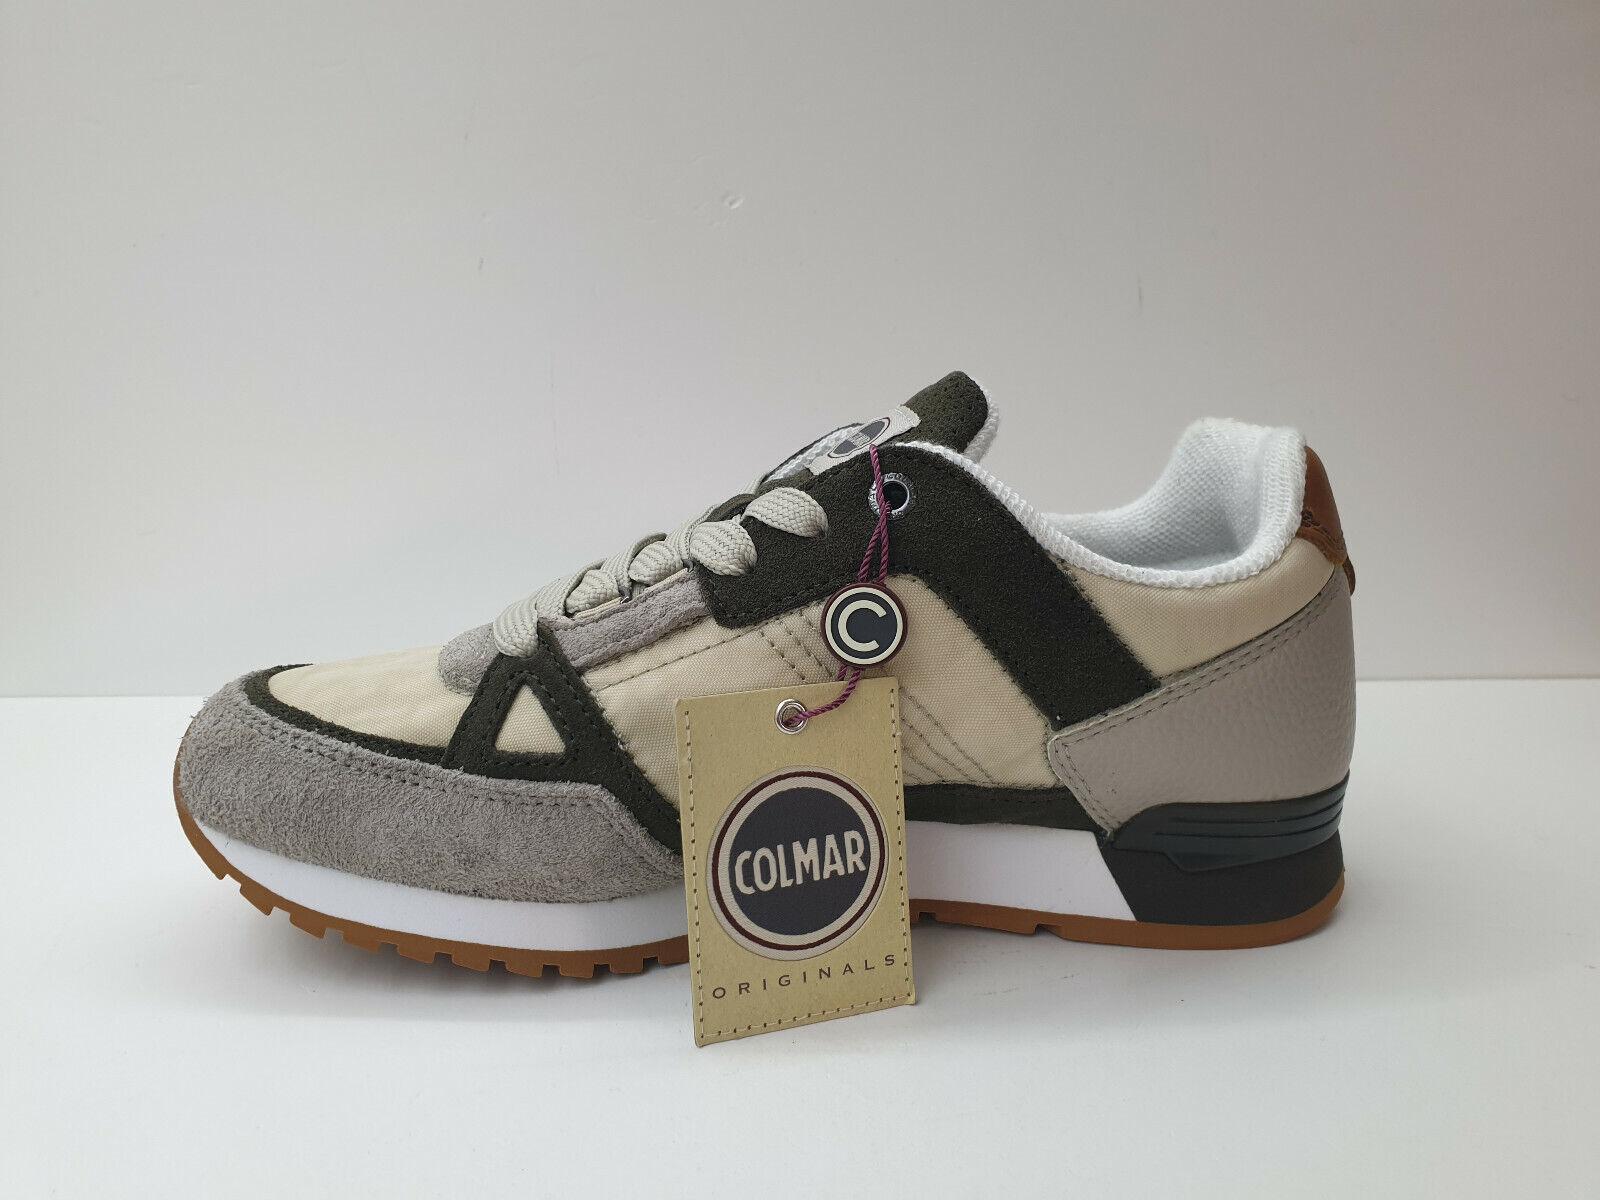 Sneakers men Colmar  - Art.  TRAVIS SUPREME  Col. Beige -green - Sconto 55%